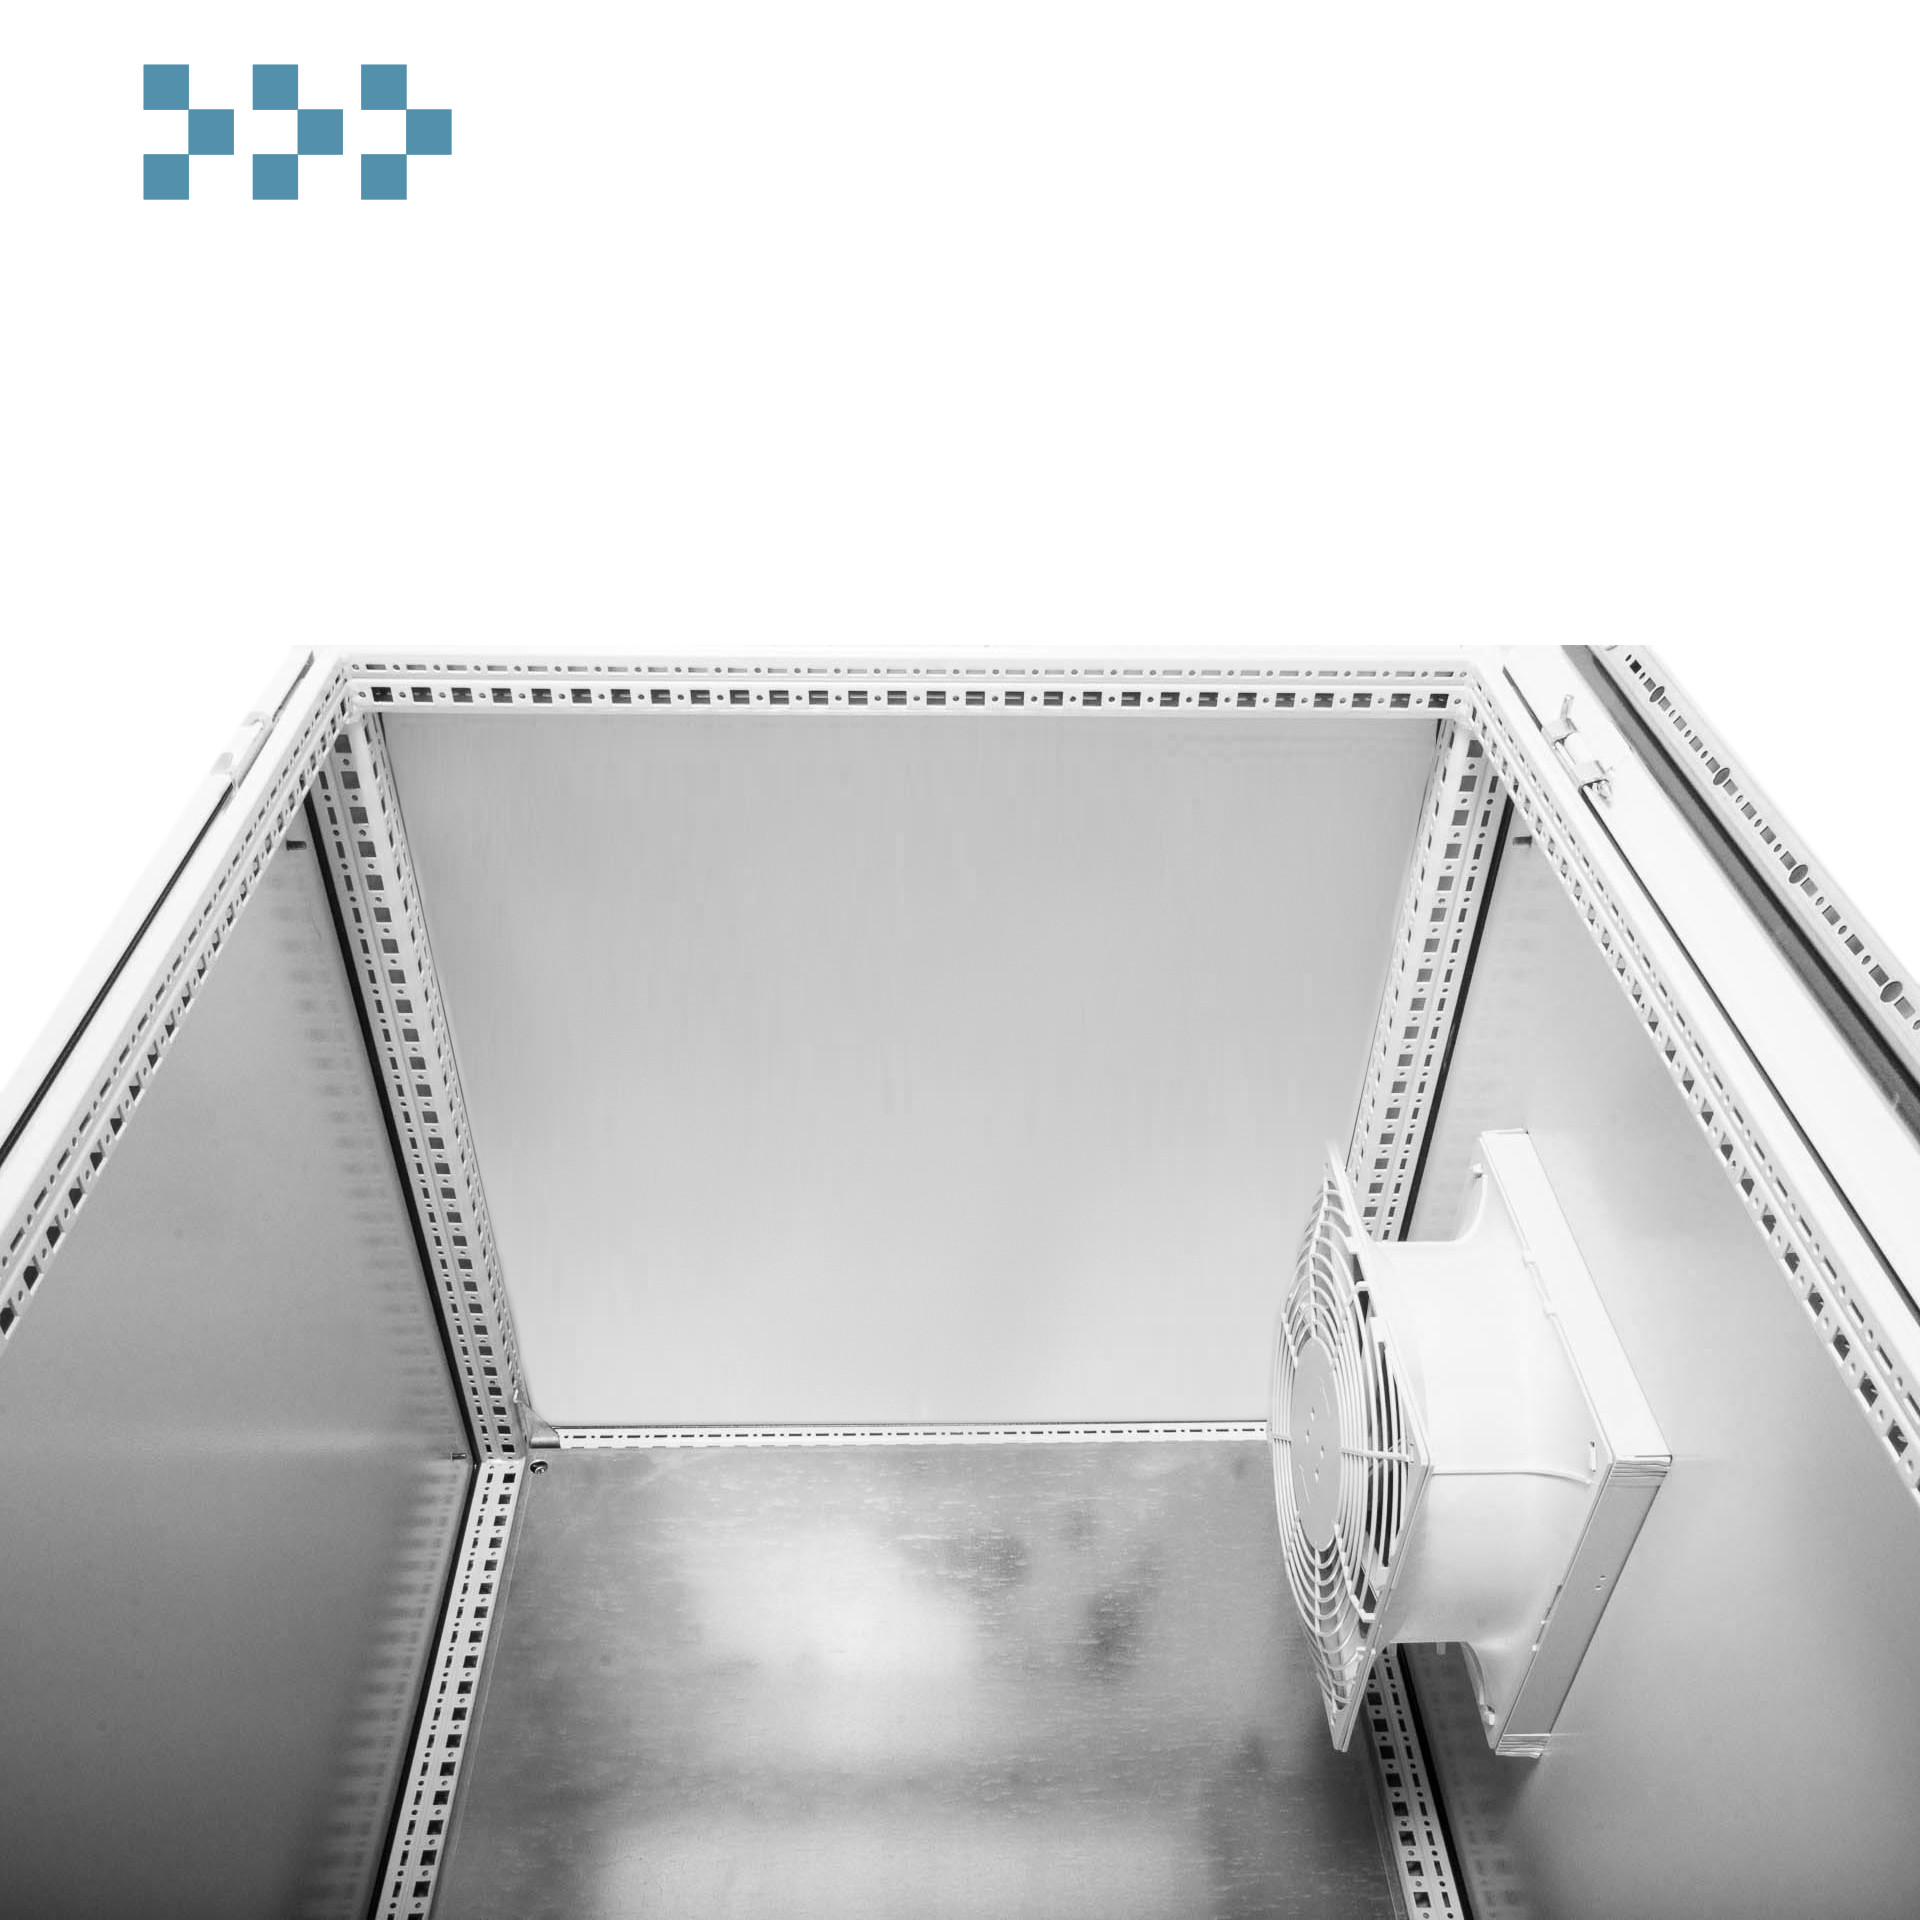 Комплект боковых стенок для монтажа вентилятора Pfannenberg PF Elbox EMS-WF-2200.x.600